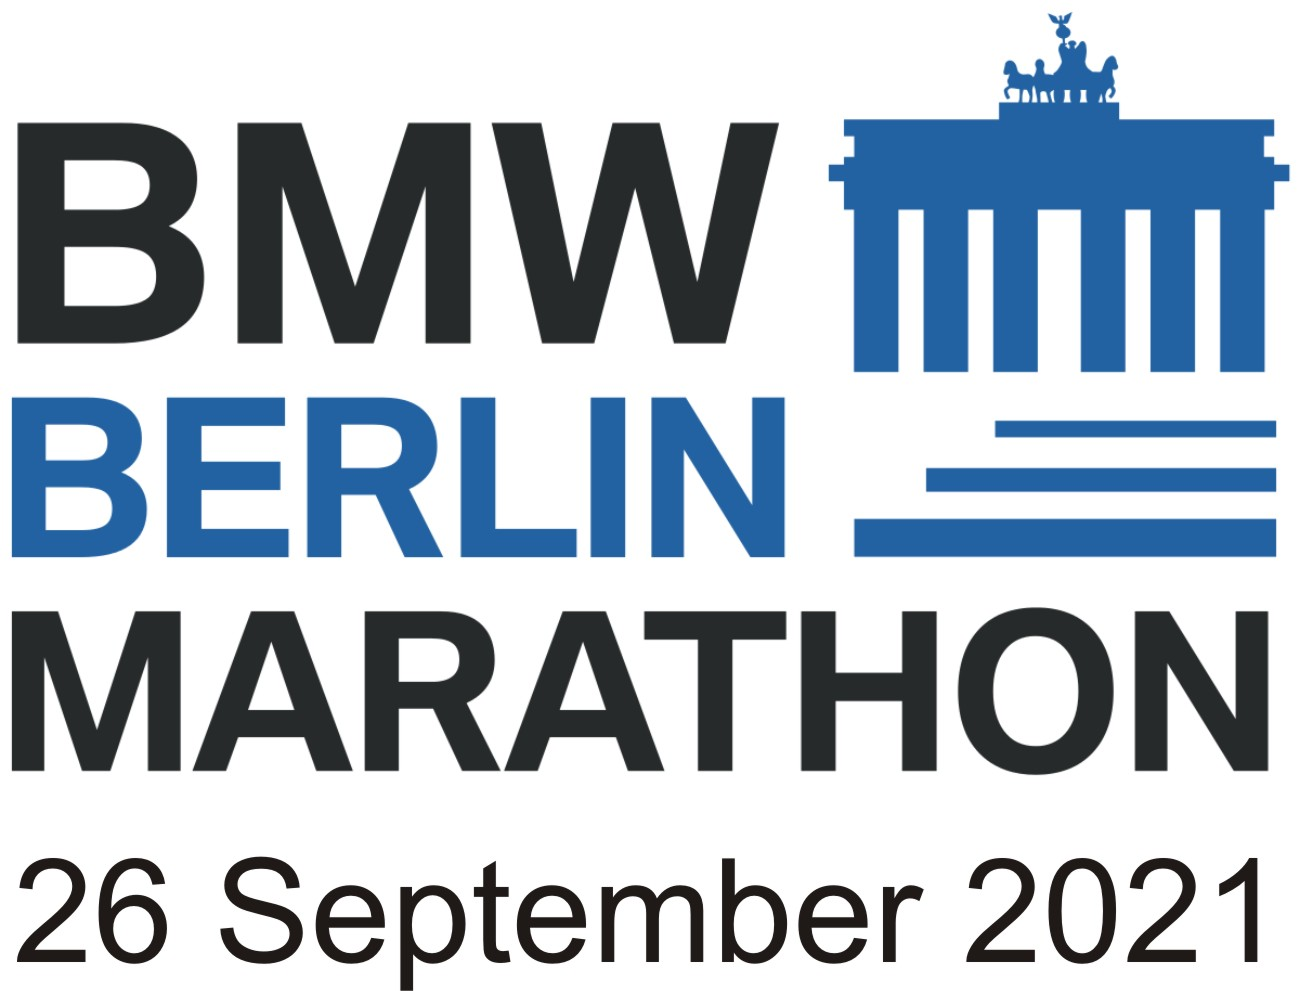 Berlin Marathon 2021 Logo